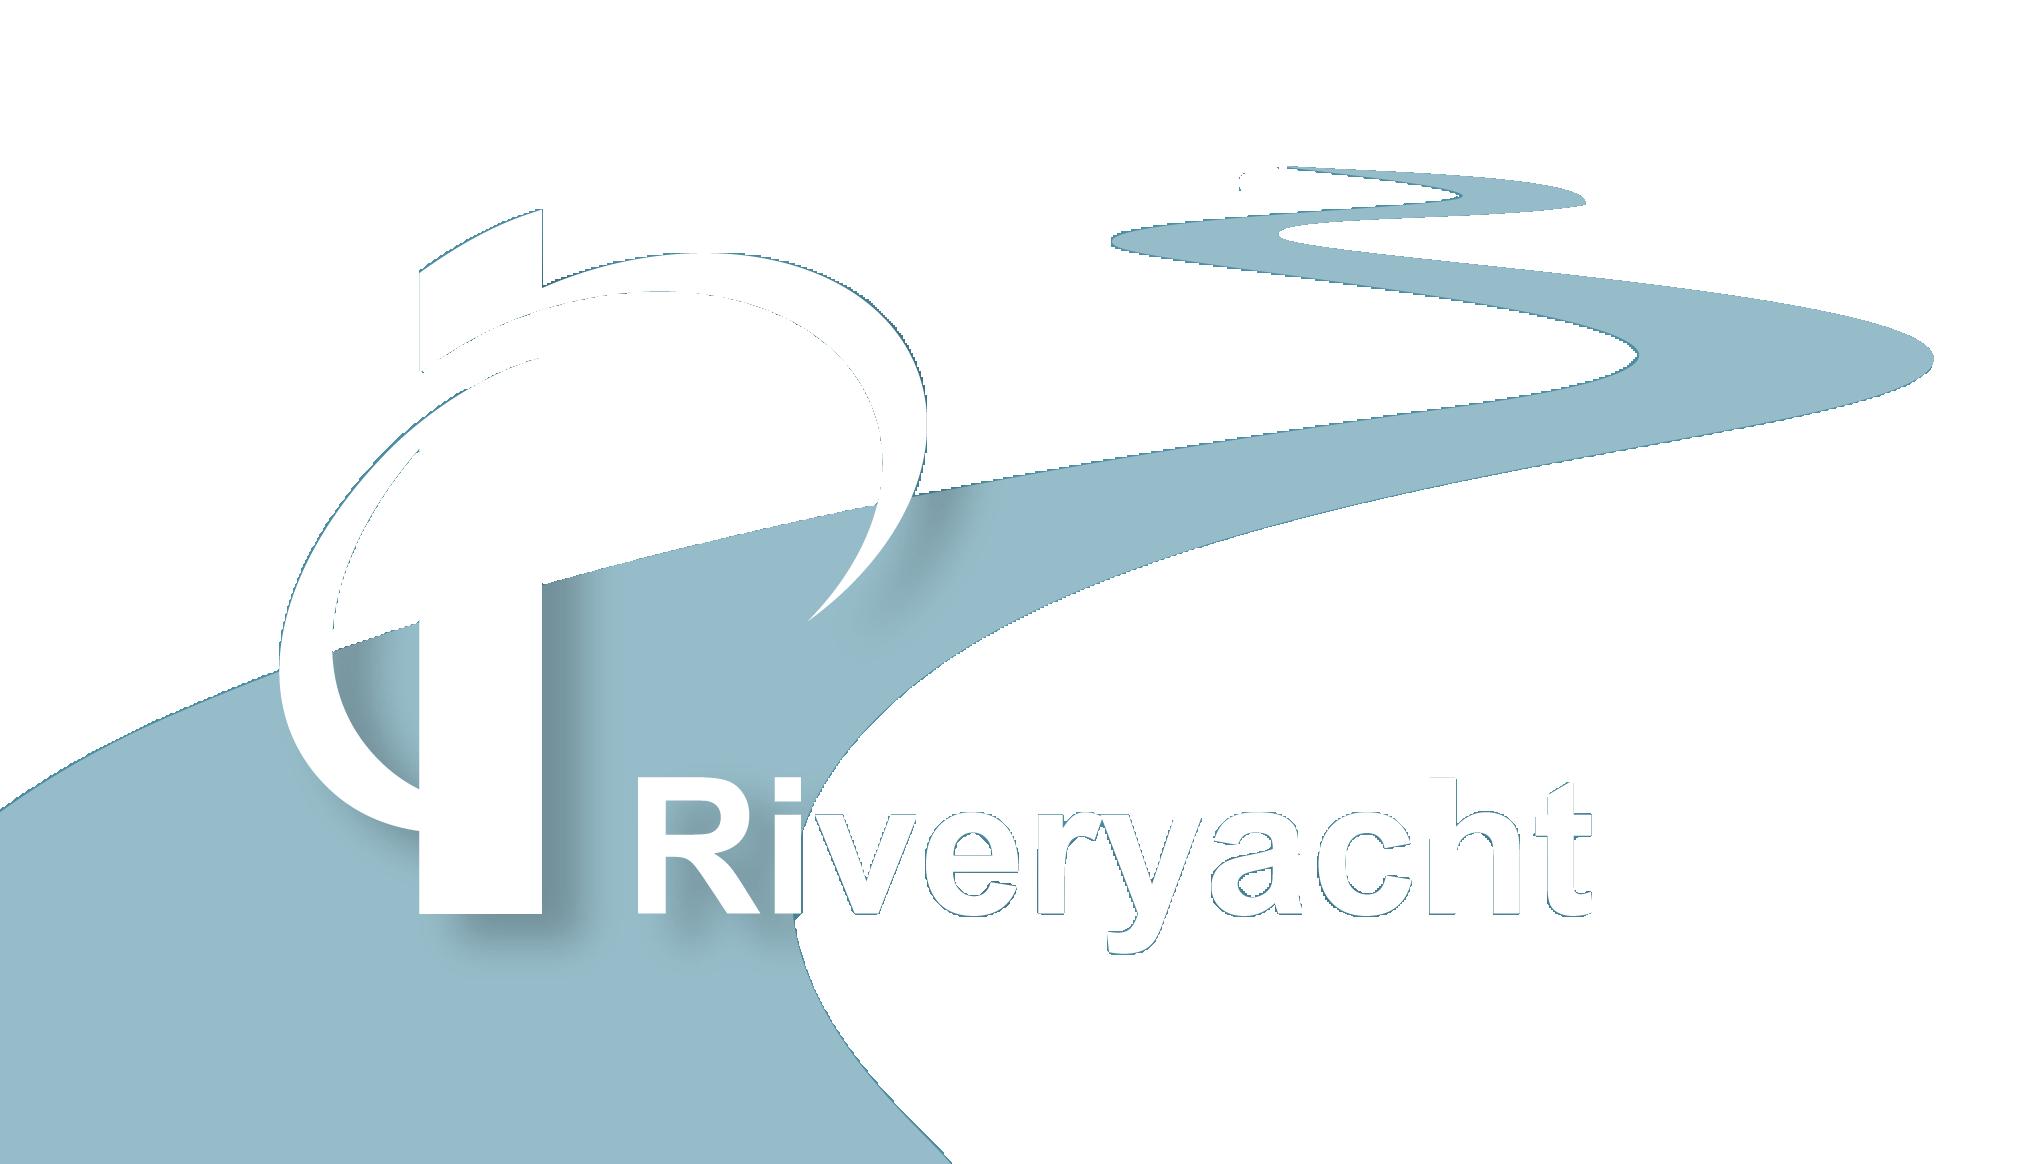 Riveryacht